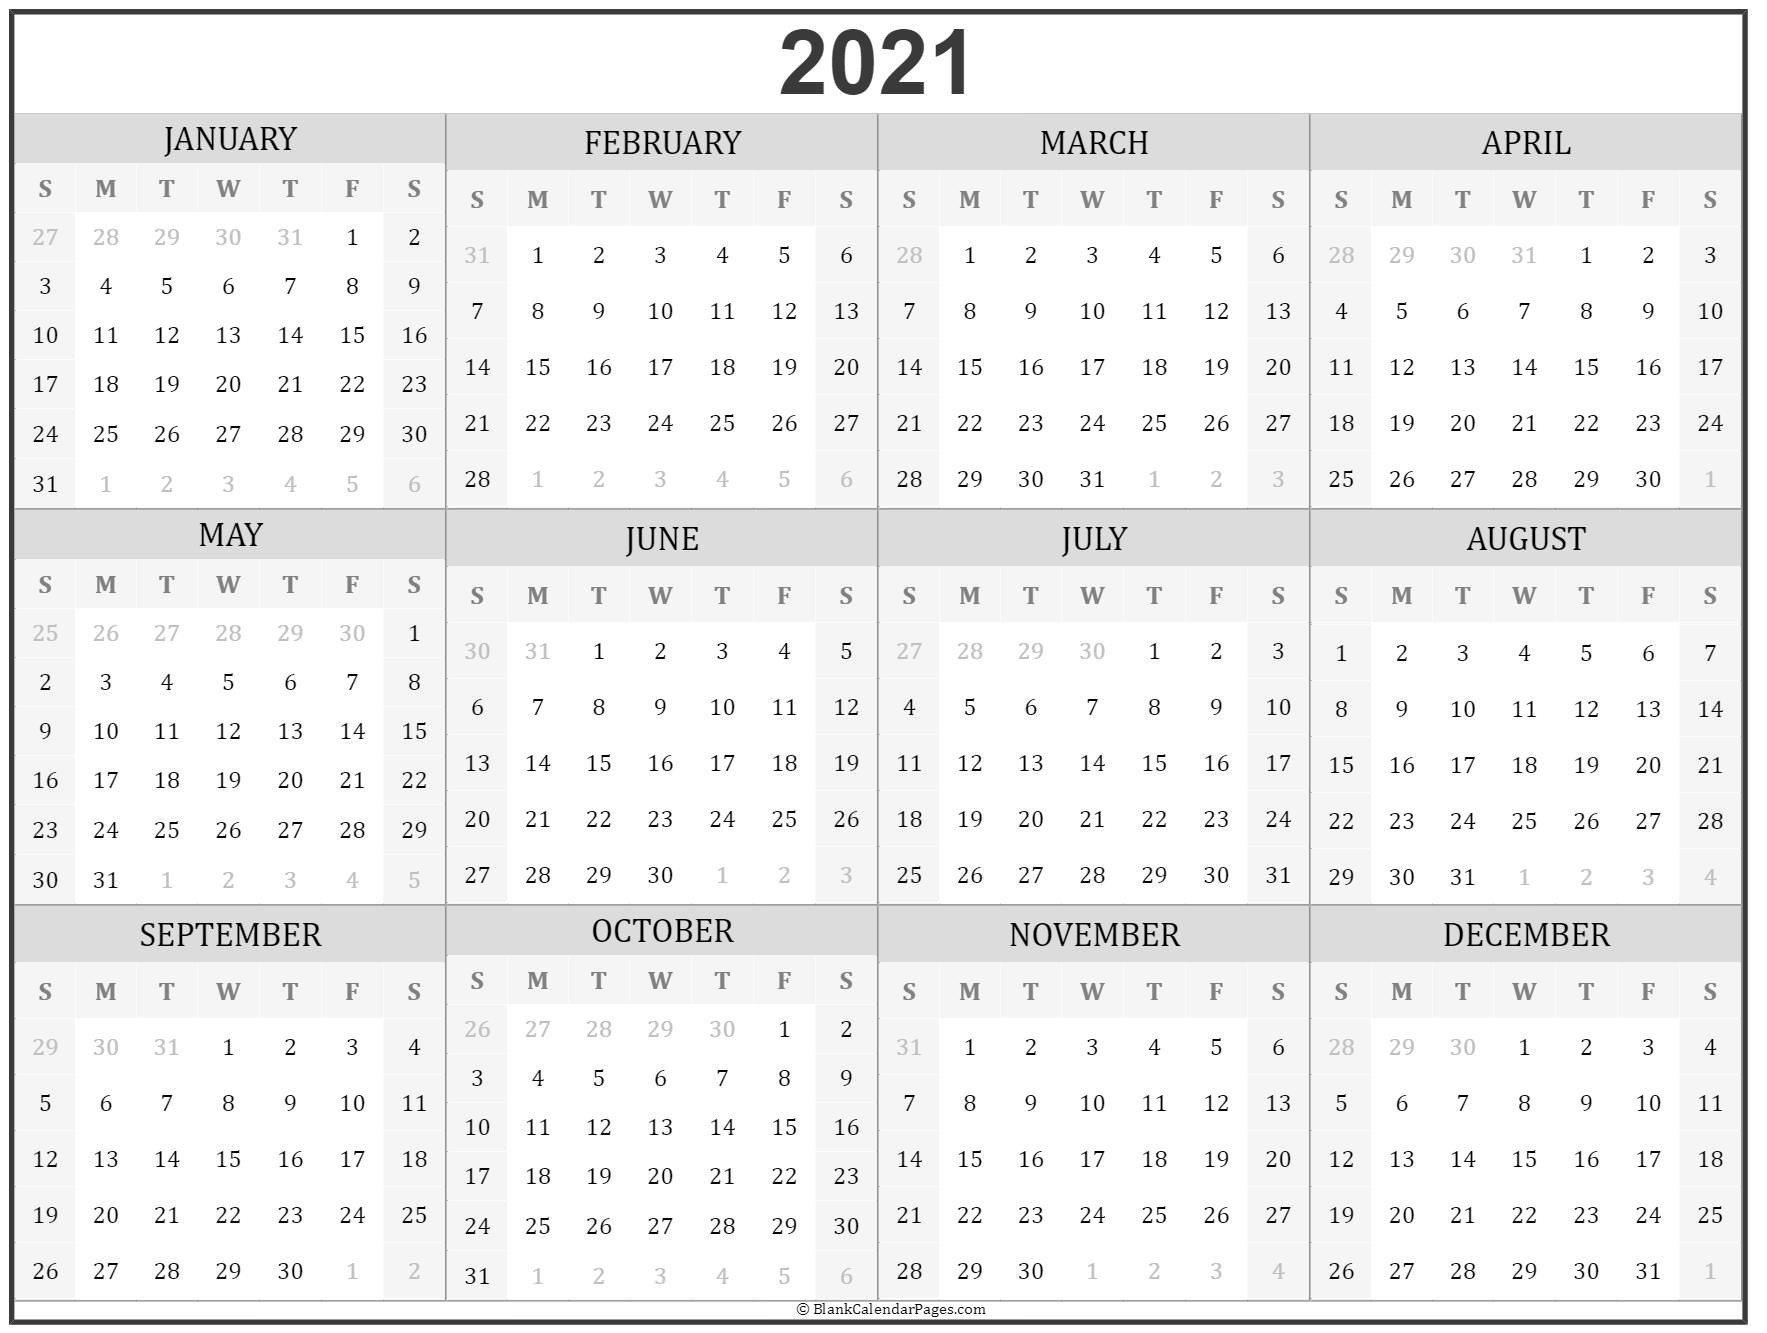 Calendar Year 2021 Printable Free | Free Printable Calendar Monthly with regard to Free Printable Yearly Calendars 2021 Portrait